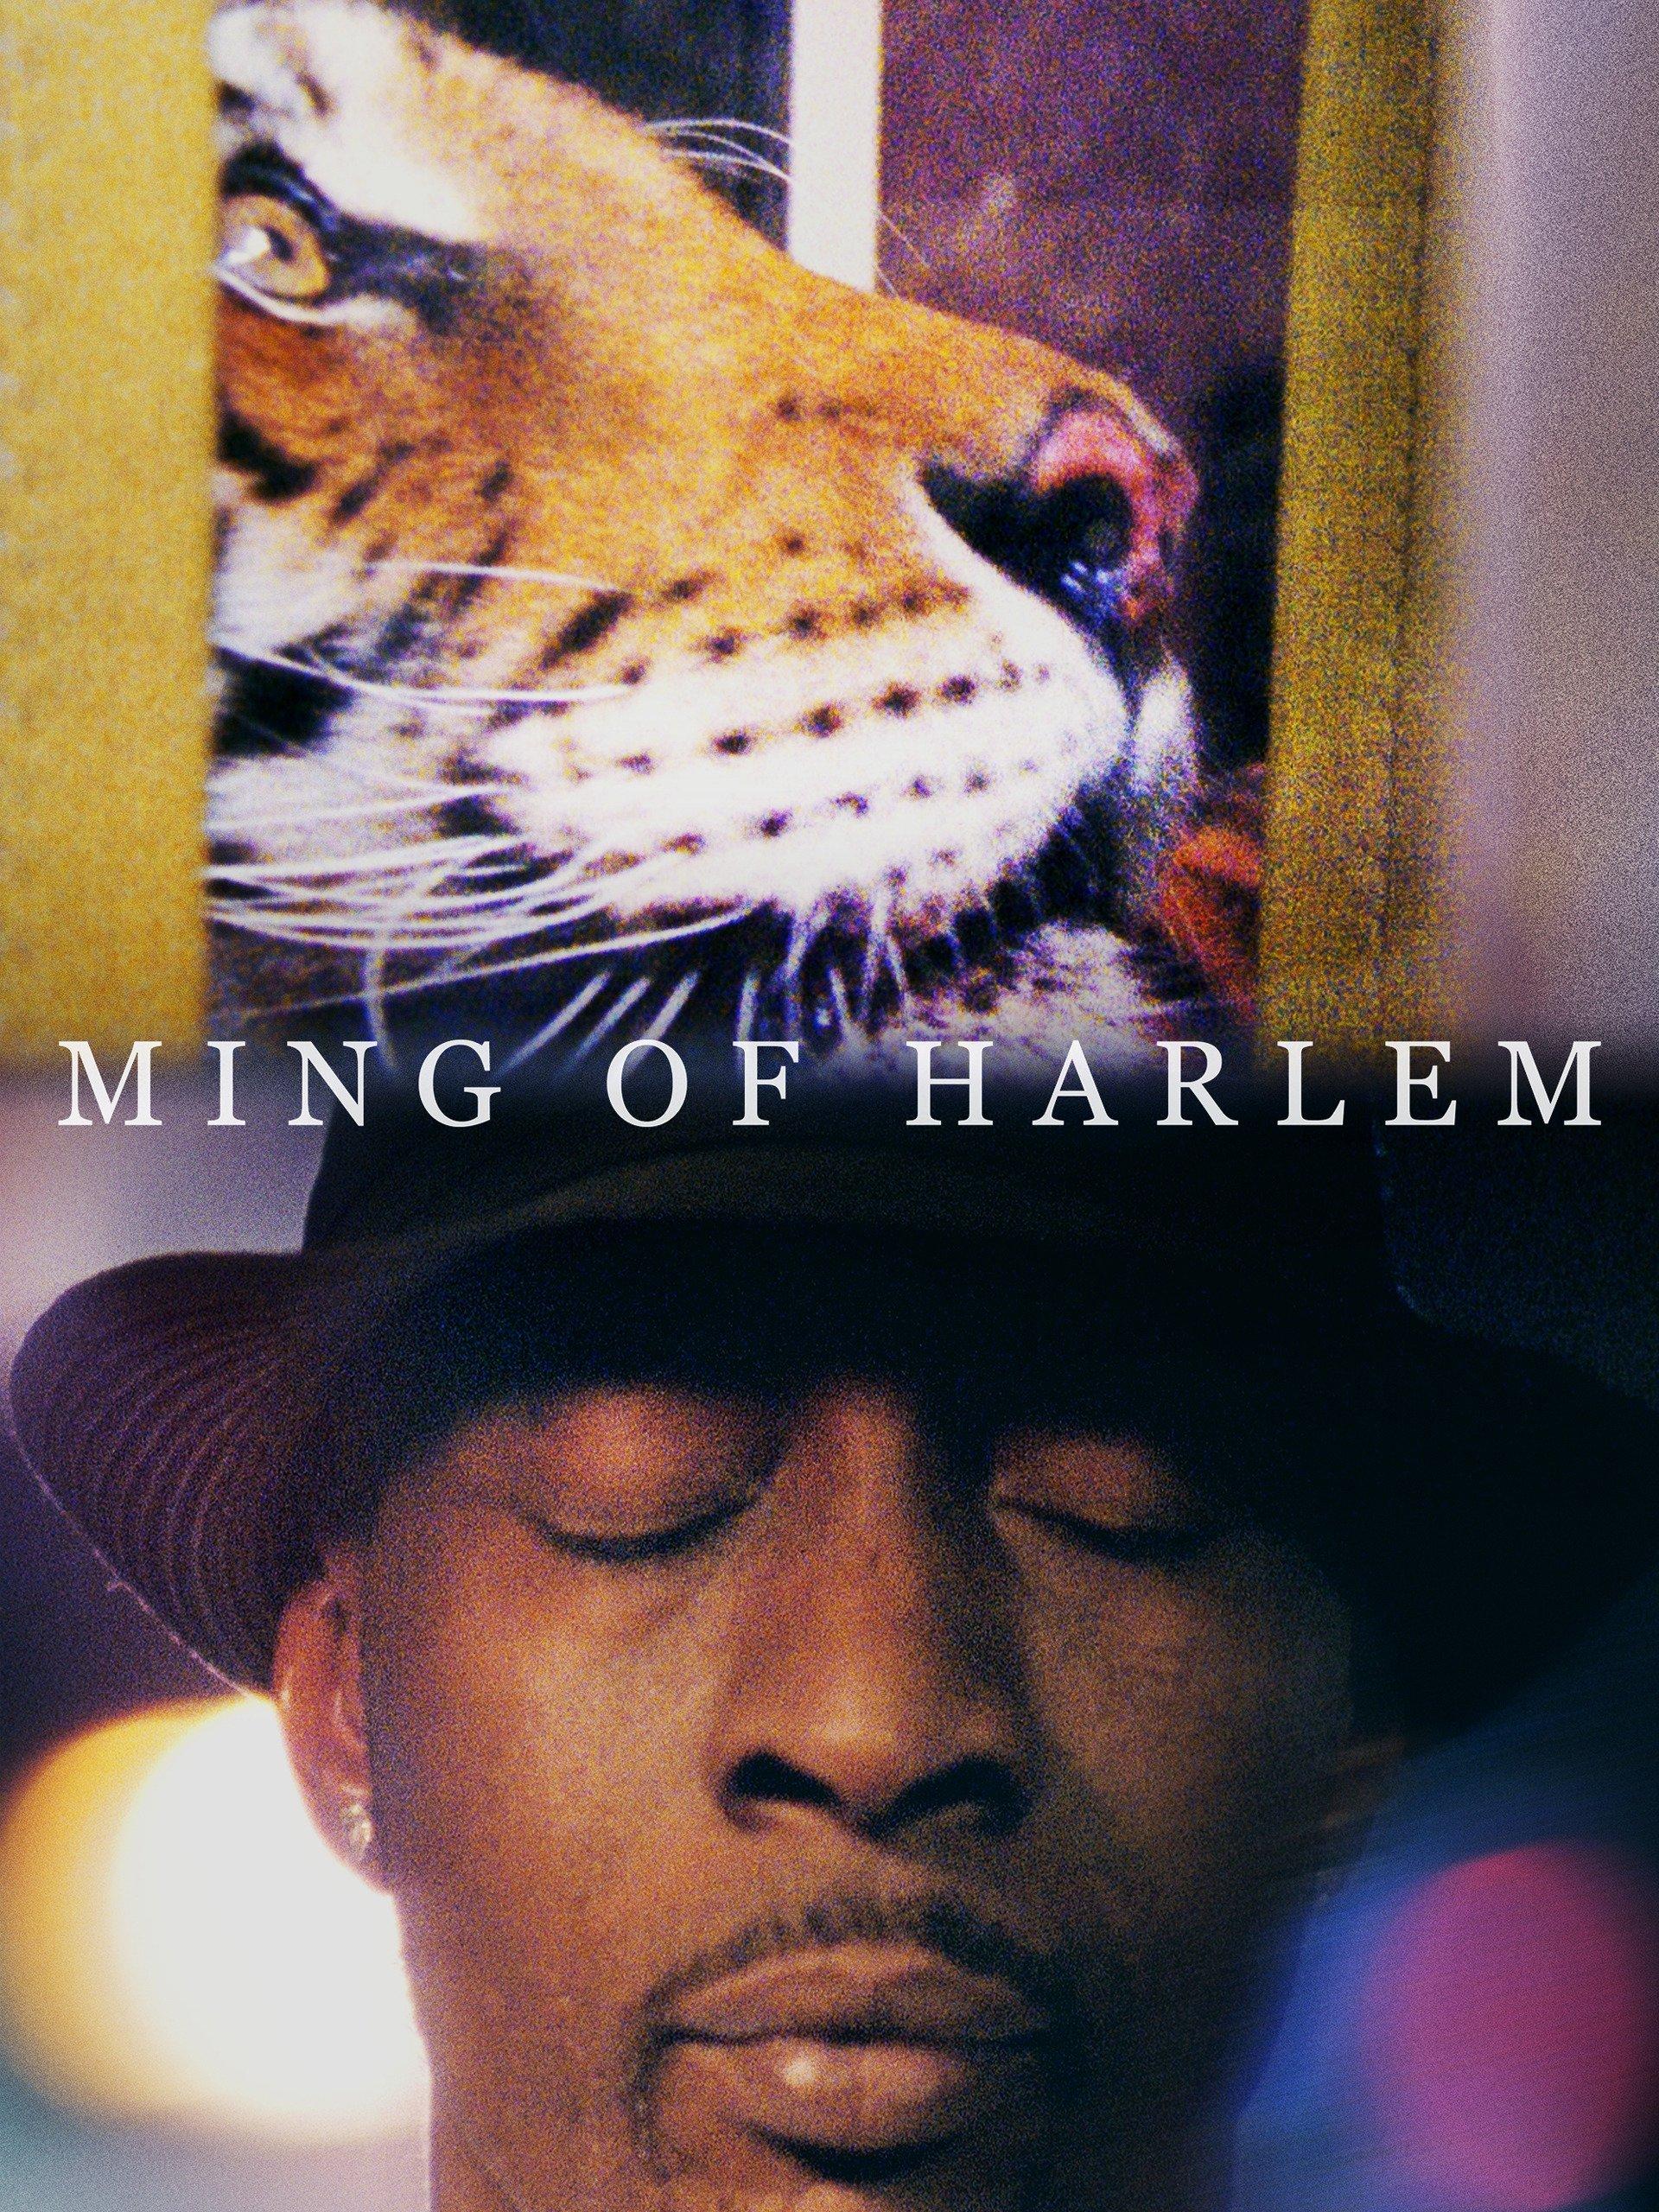 Ming of Harlem on Amazon Prime Video UK